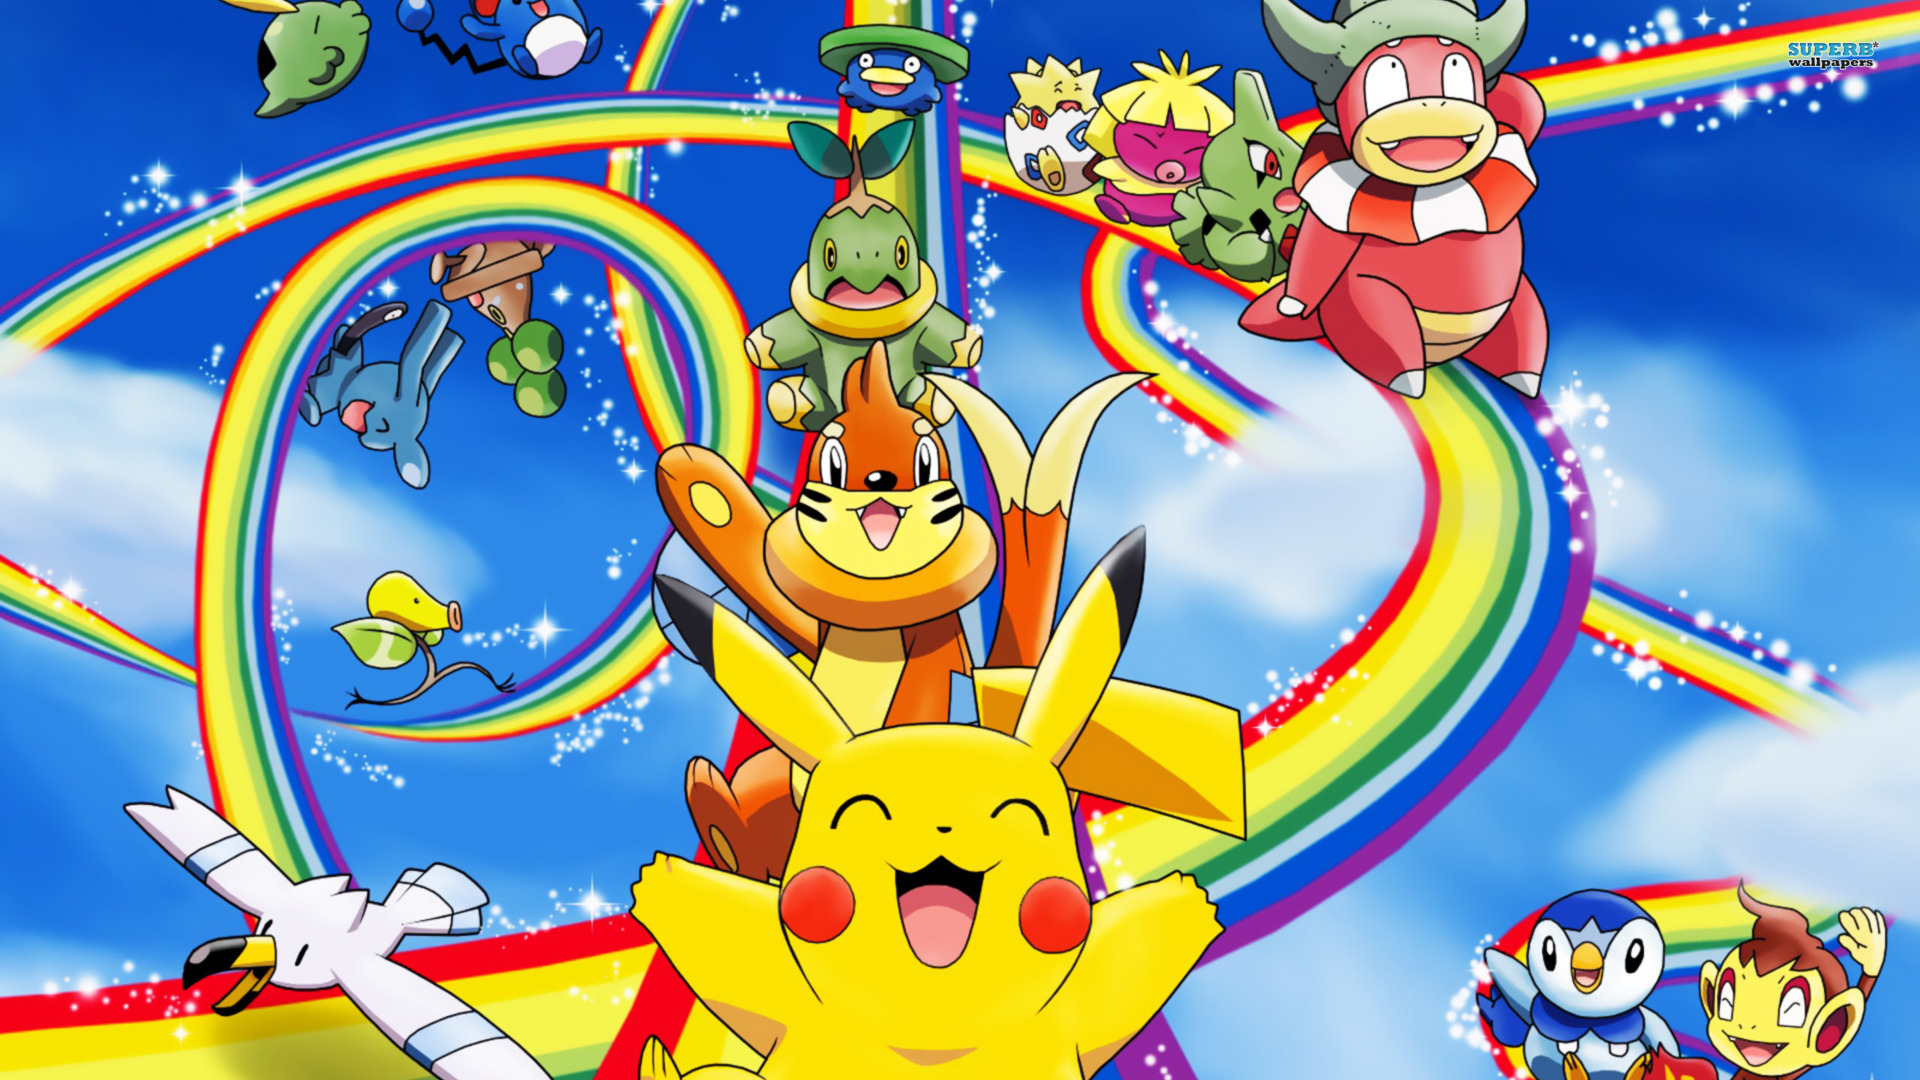 Pokemon Wallpaper , HD Wallpaper & Backgrounds